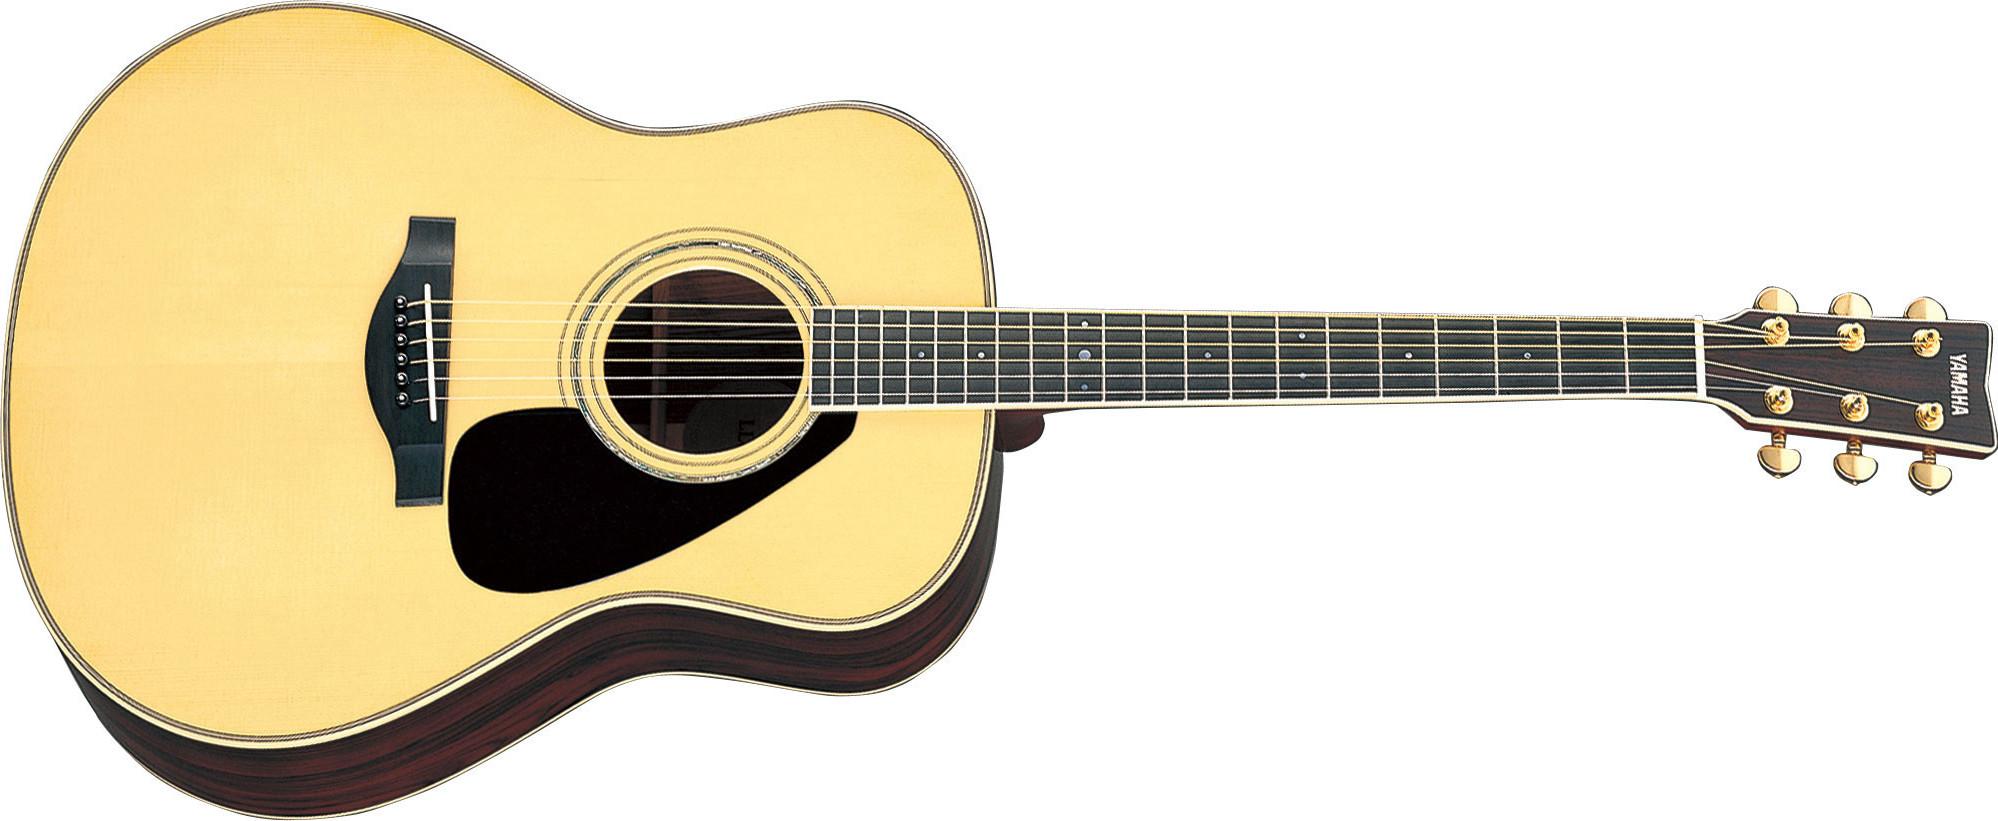 Jumbo Acoustic Guitar, Natural Gloss Finish